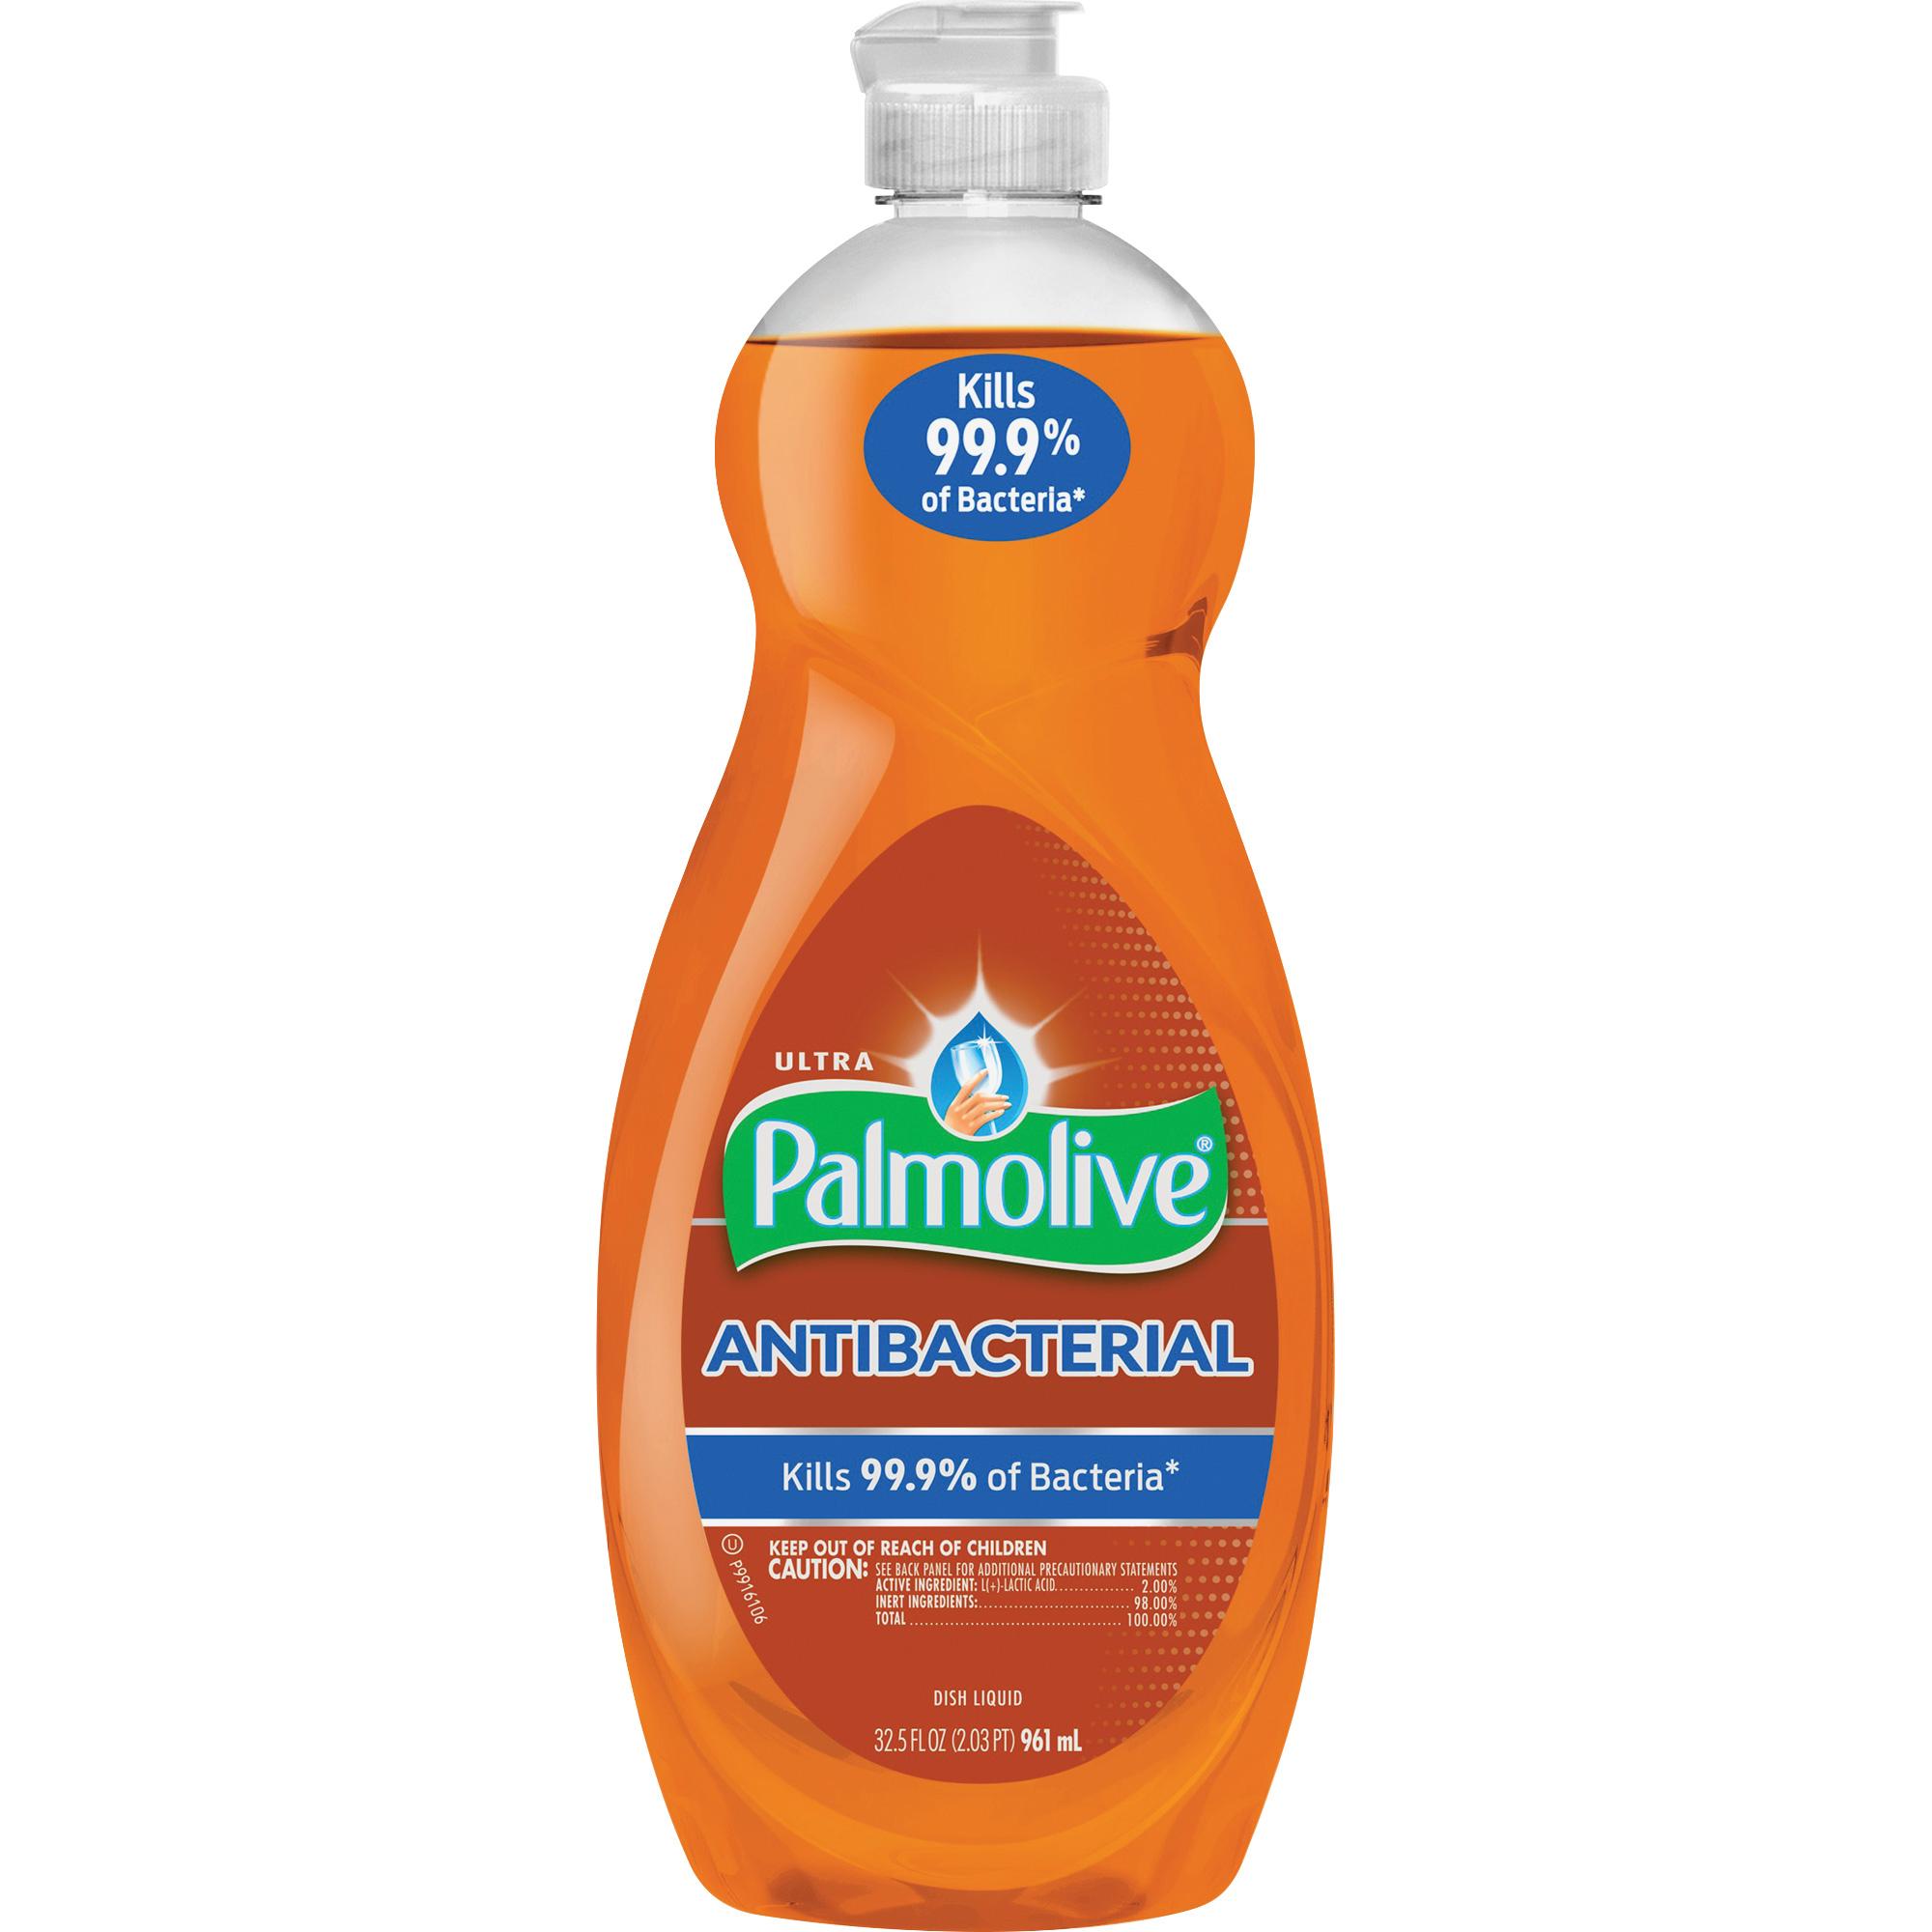 Palmolive Ultra Palmolive Antibacterial Dish Soap